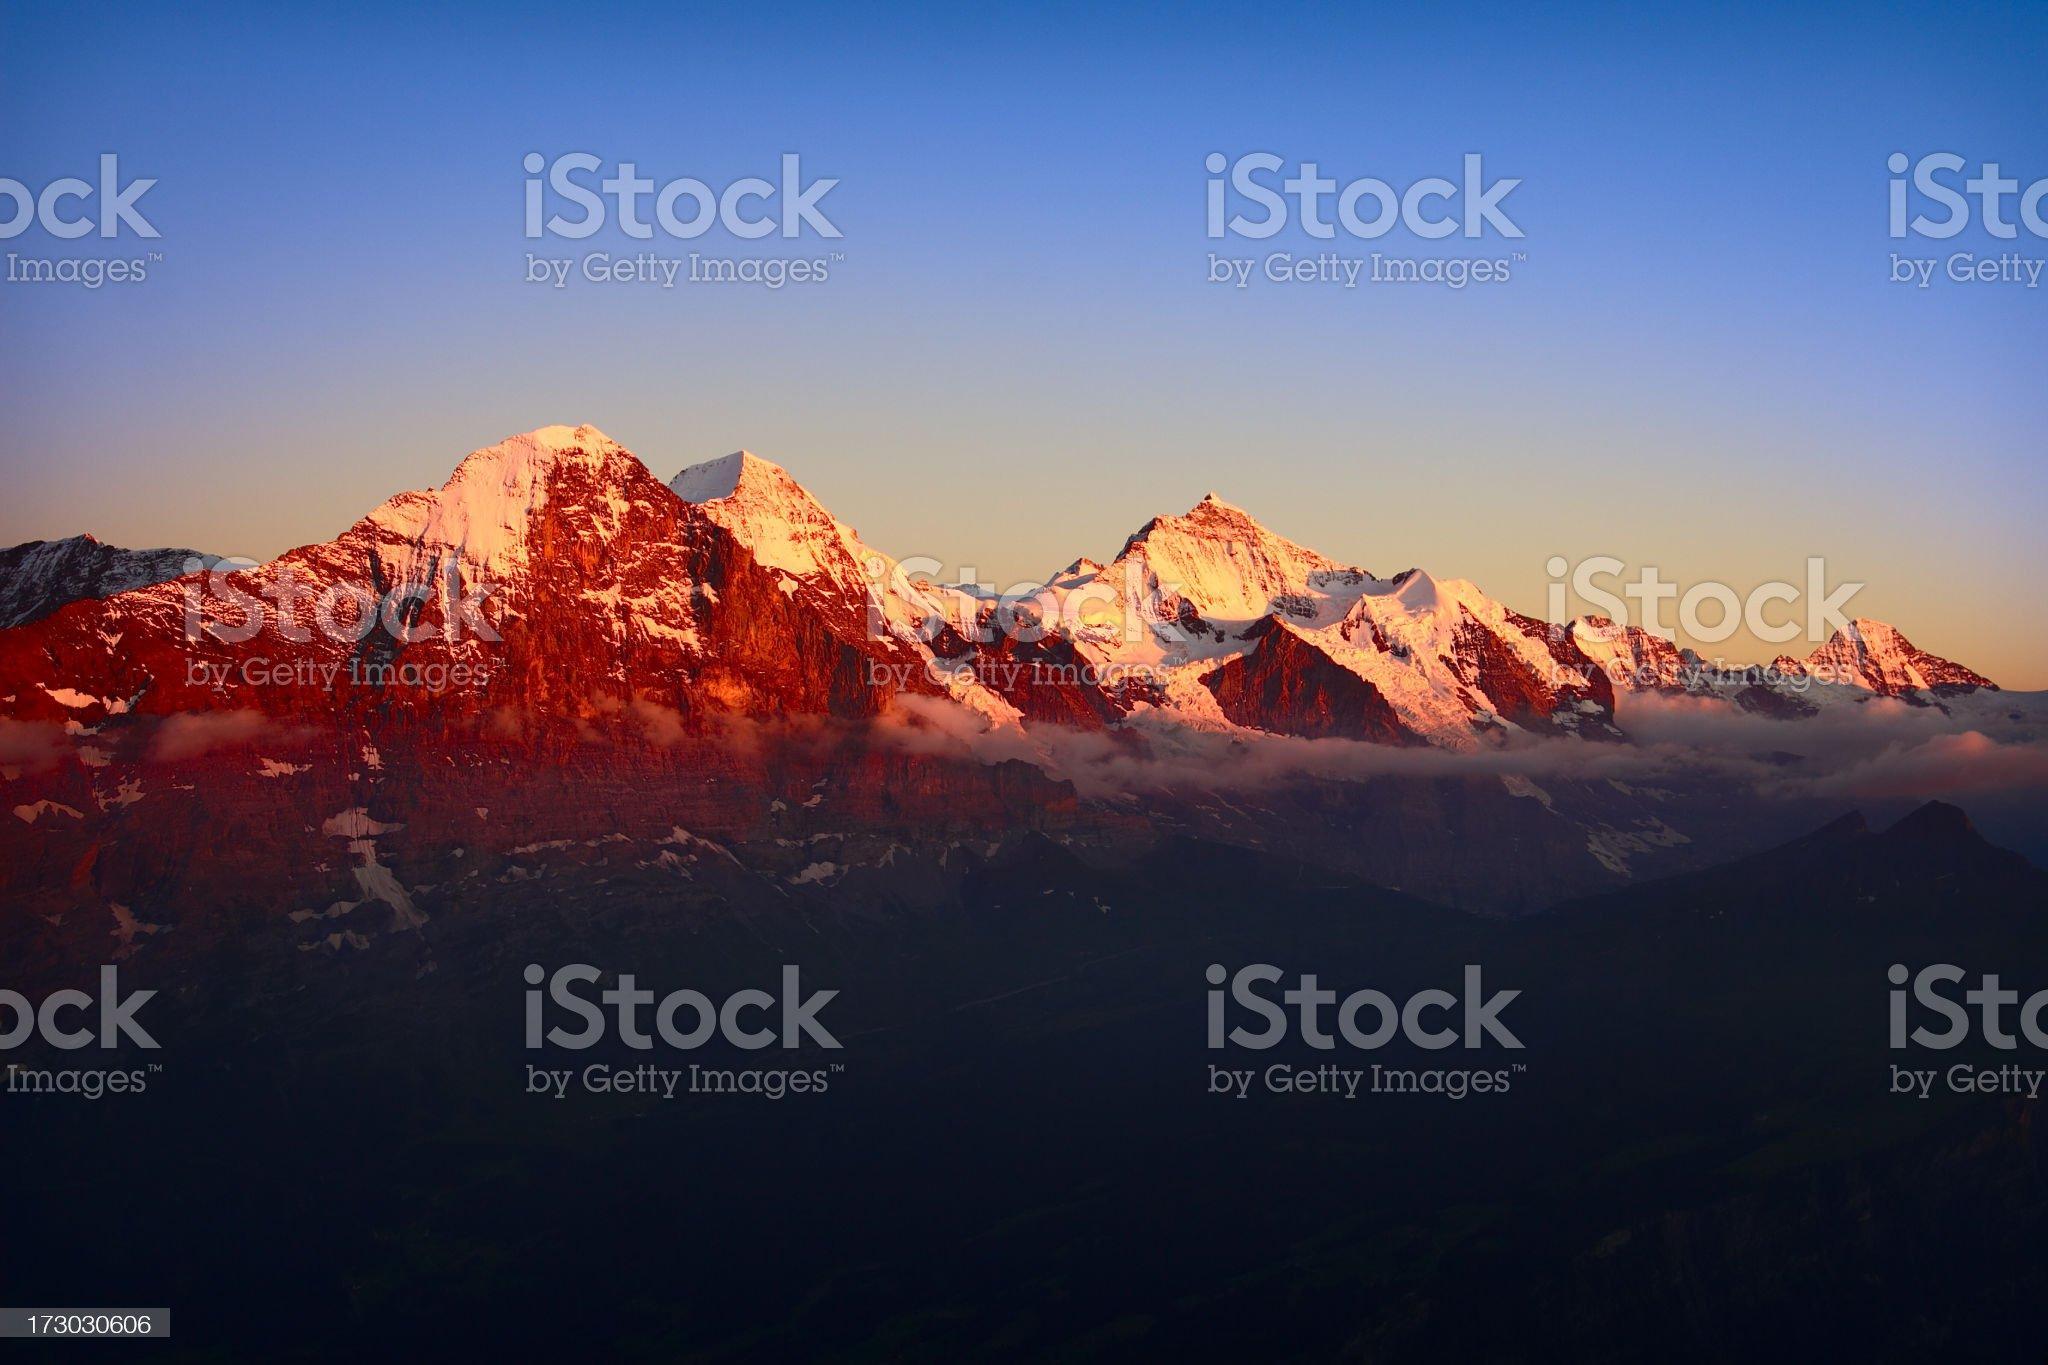 Alpengluehen Eiger mountains at sunset royalty-free stock photo